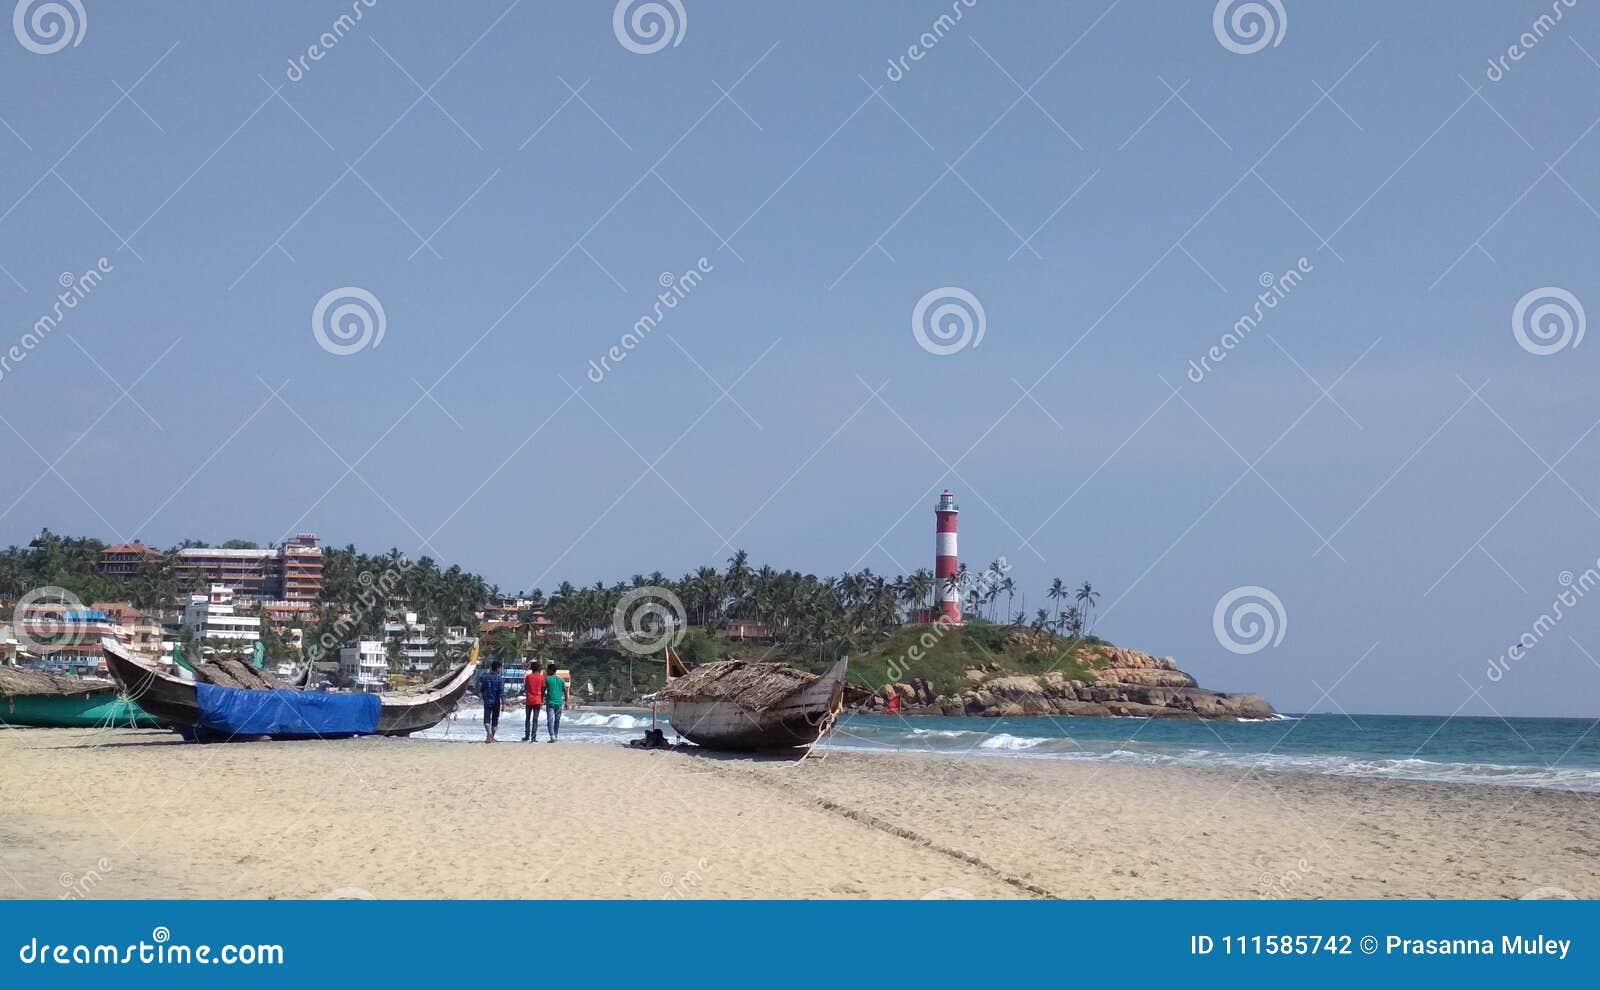 Light House At Kovalam Beach Stock Photo - Image of beach